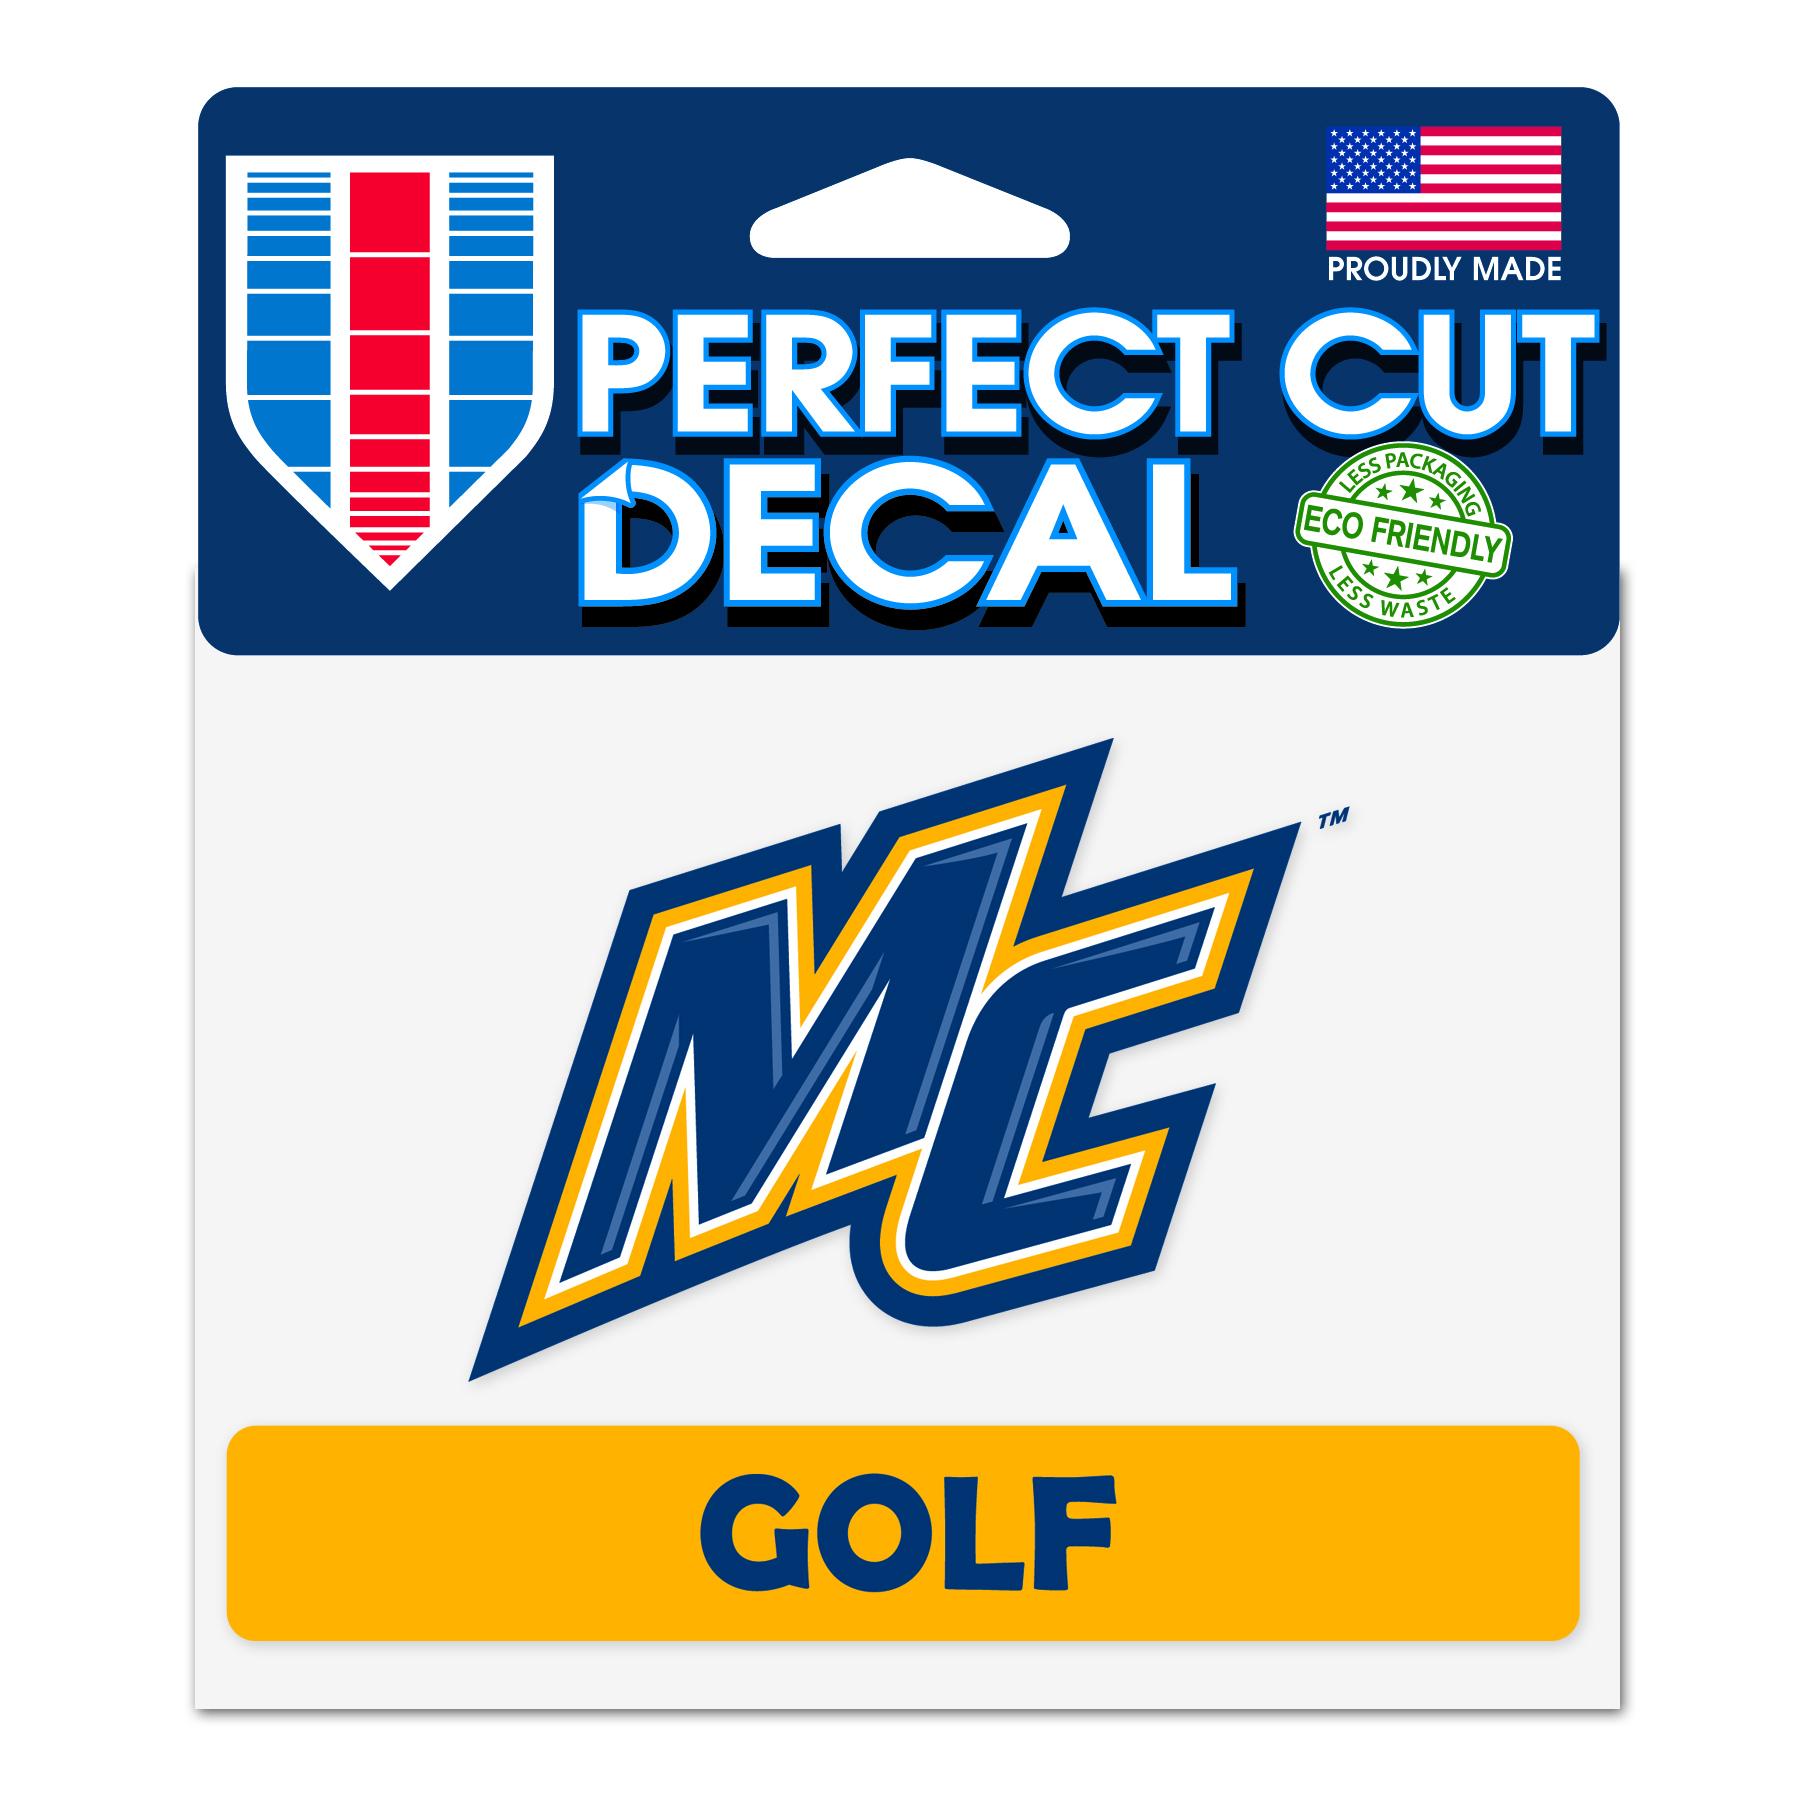 Decal - Golf